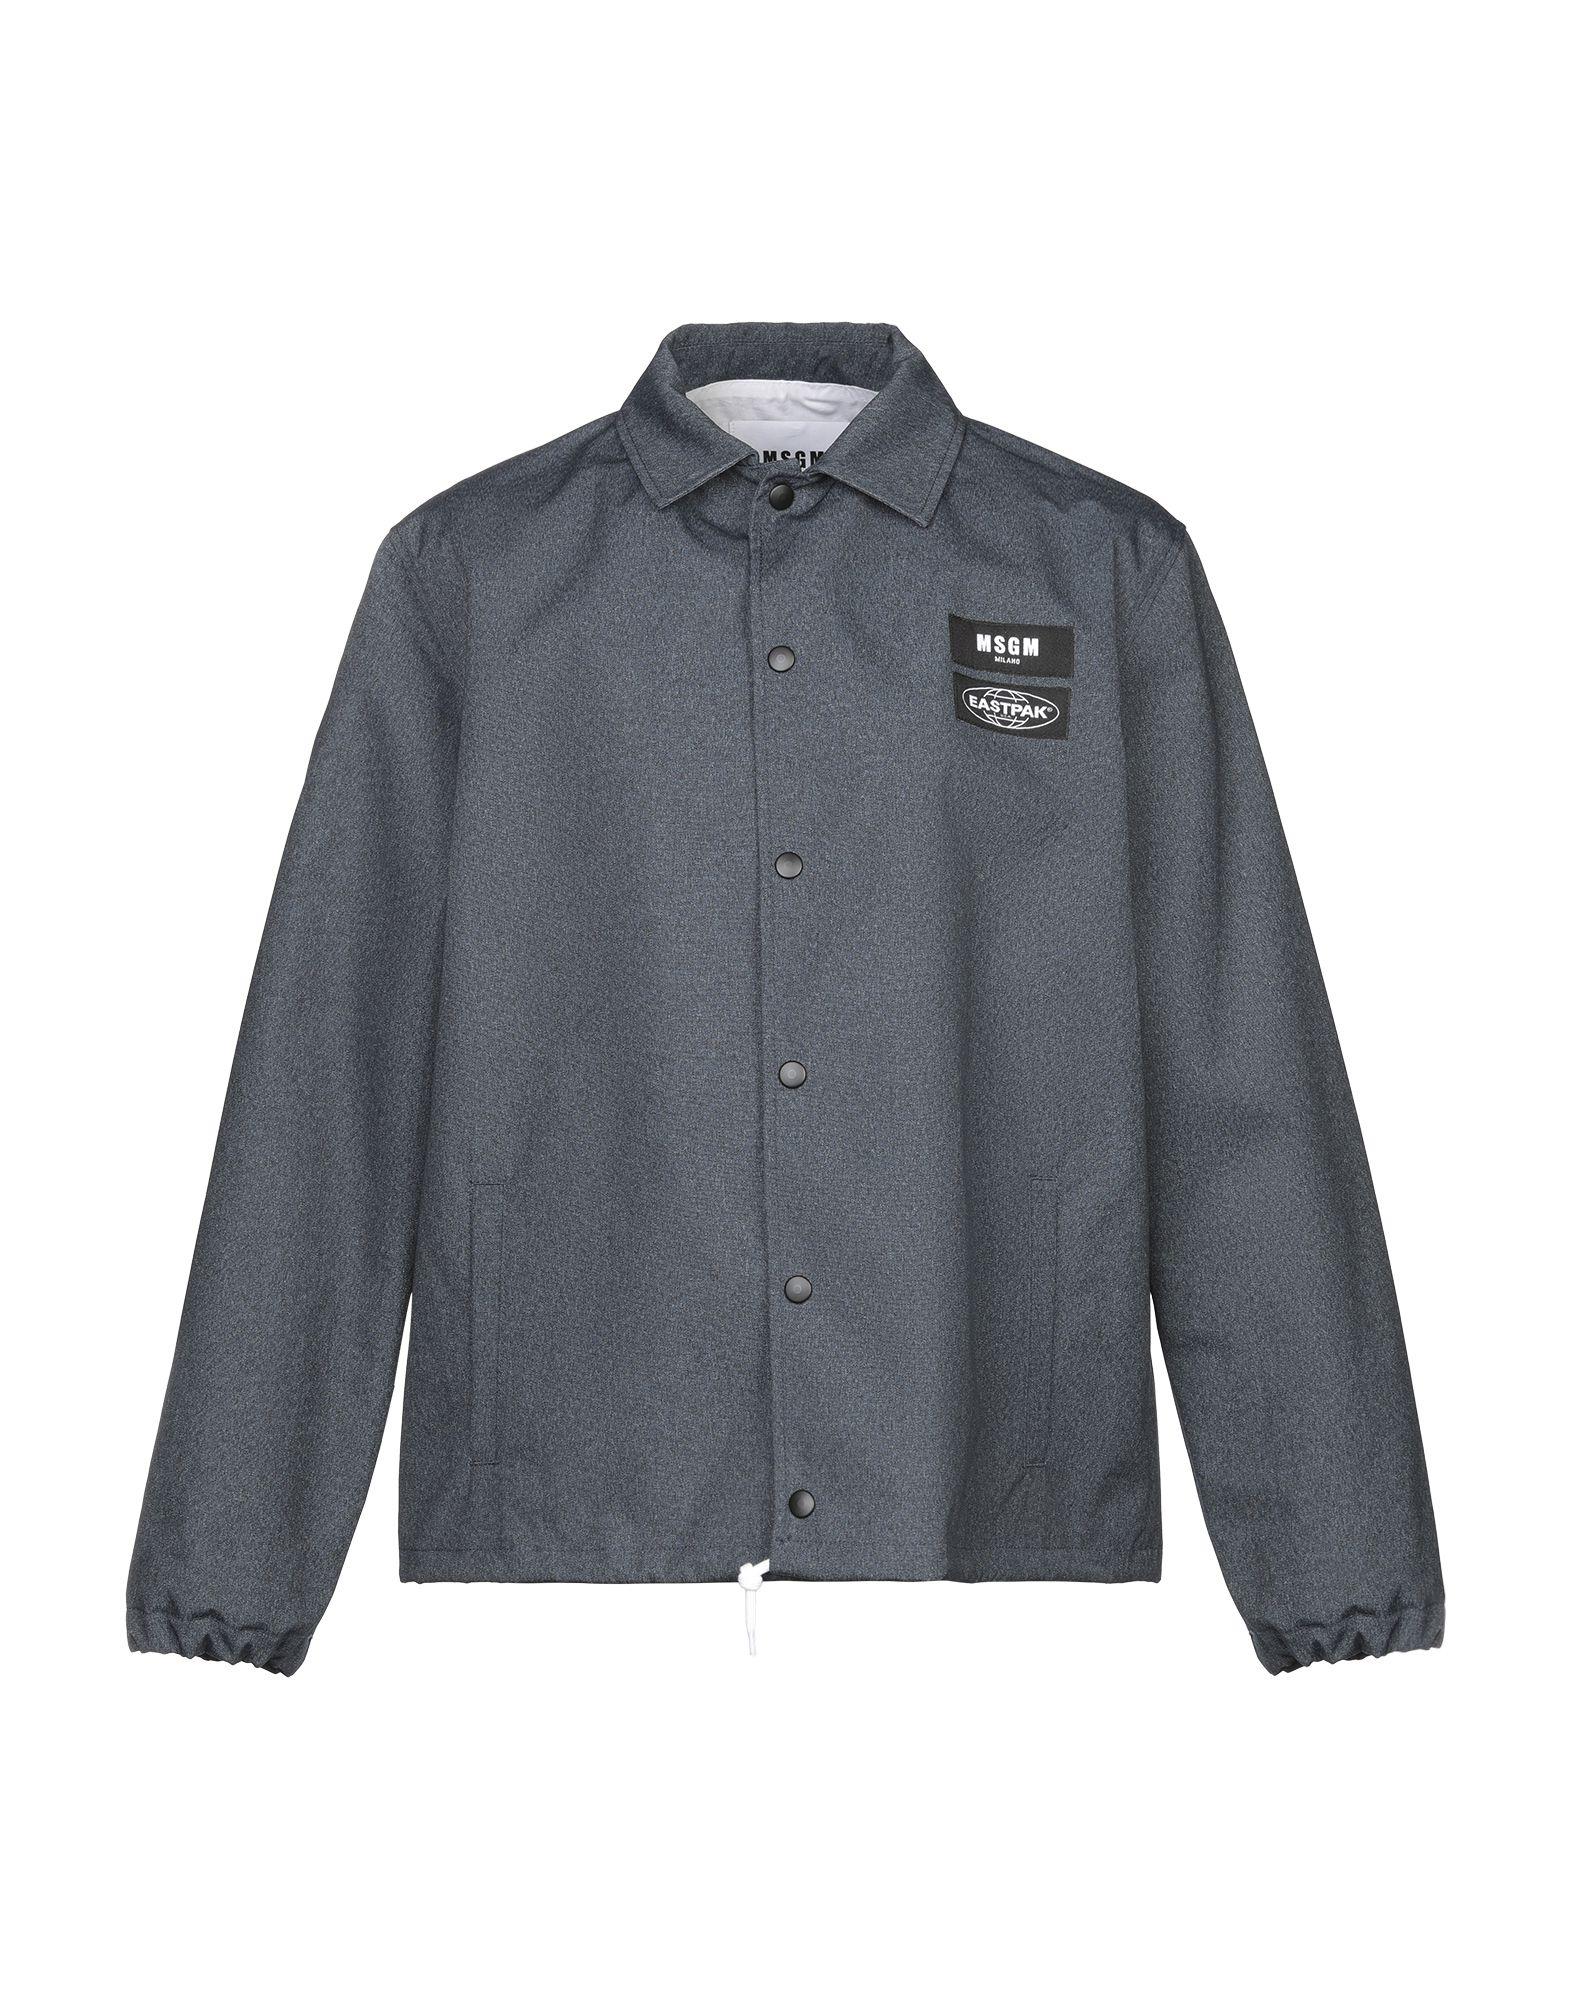 EASTPAK x MSGM Куртка цена